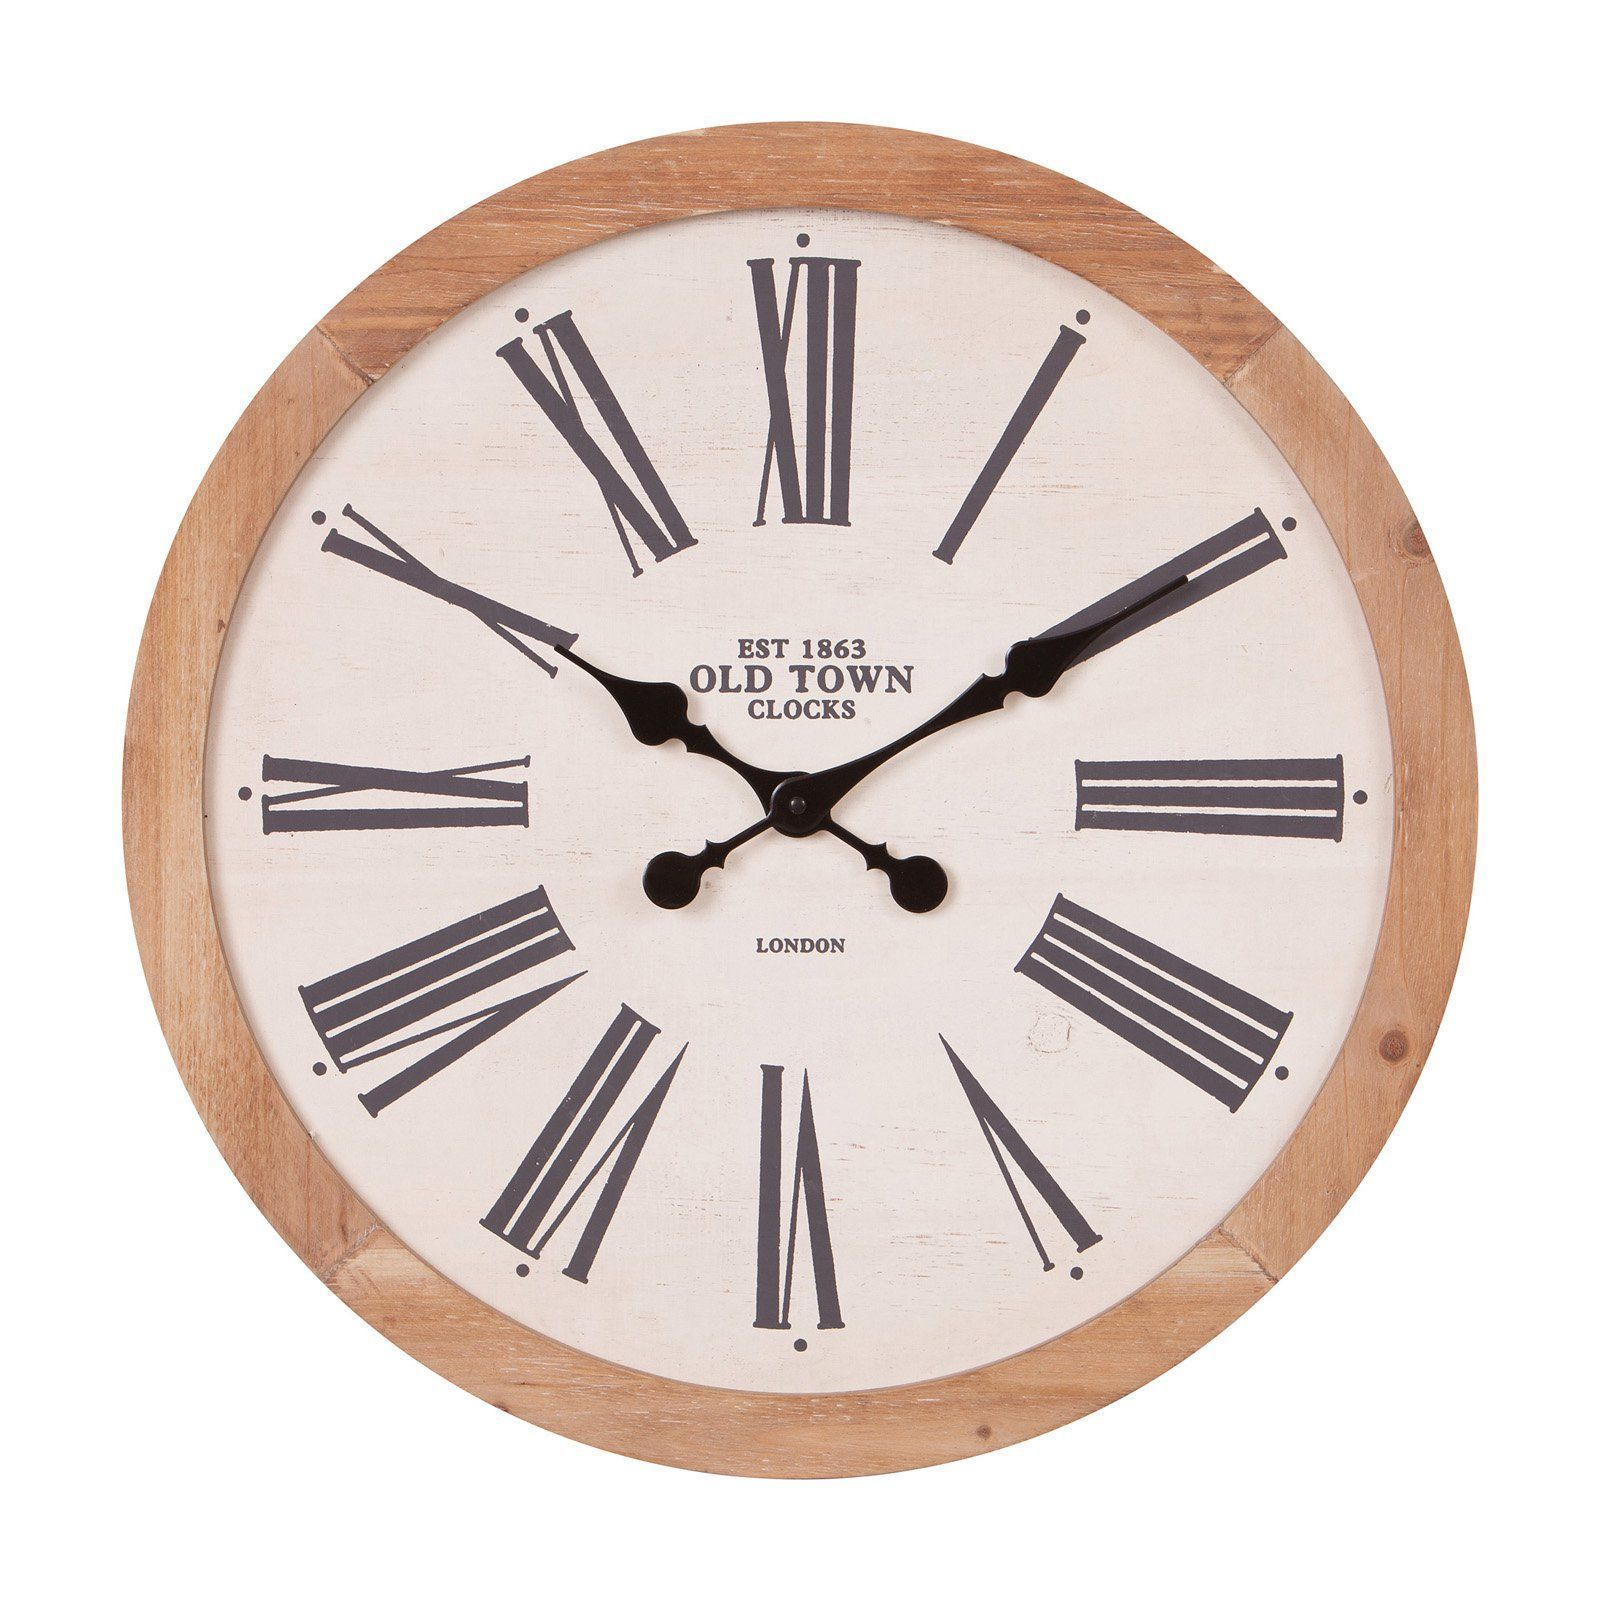 Nielsen Bainbridge Rustic Wood Old Town Roman Numeral 22 in. Wall Clock#bainbridge #clock #nielsen #numeral #roman #rustic #town #wall #wood